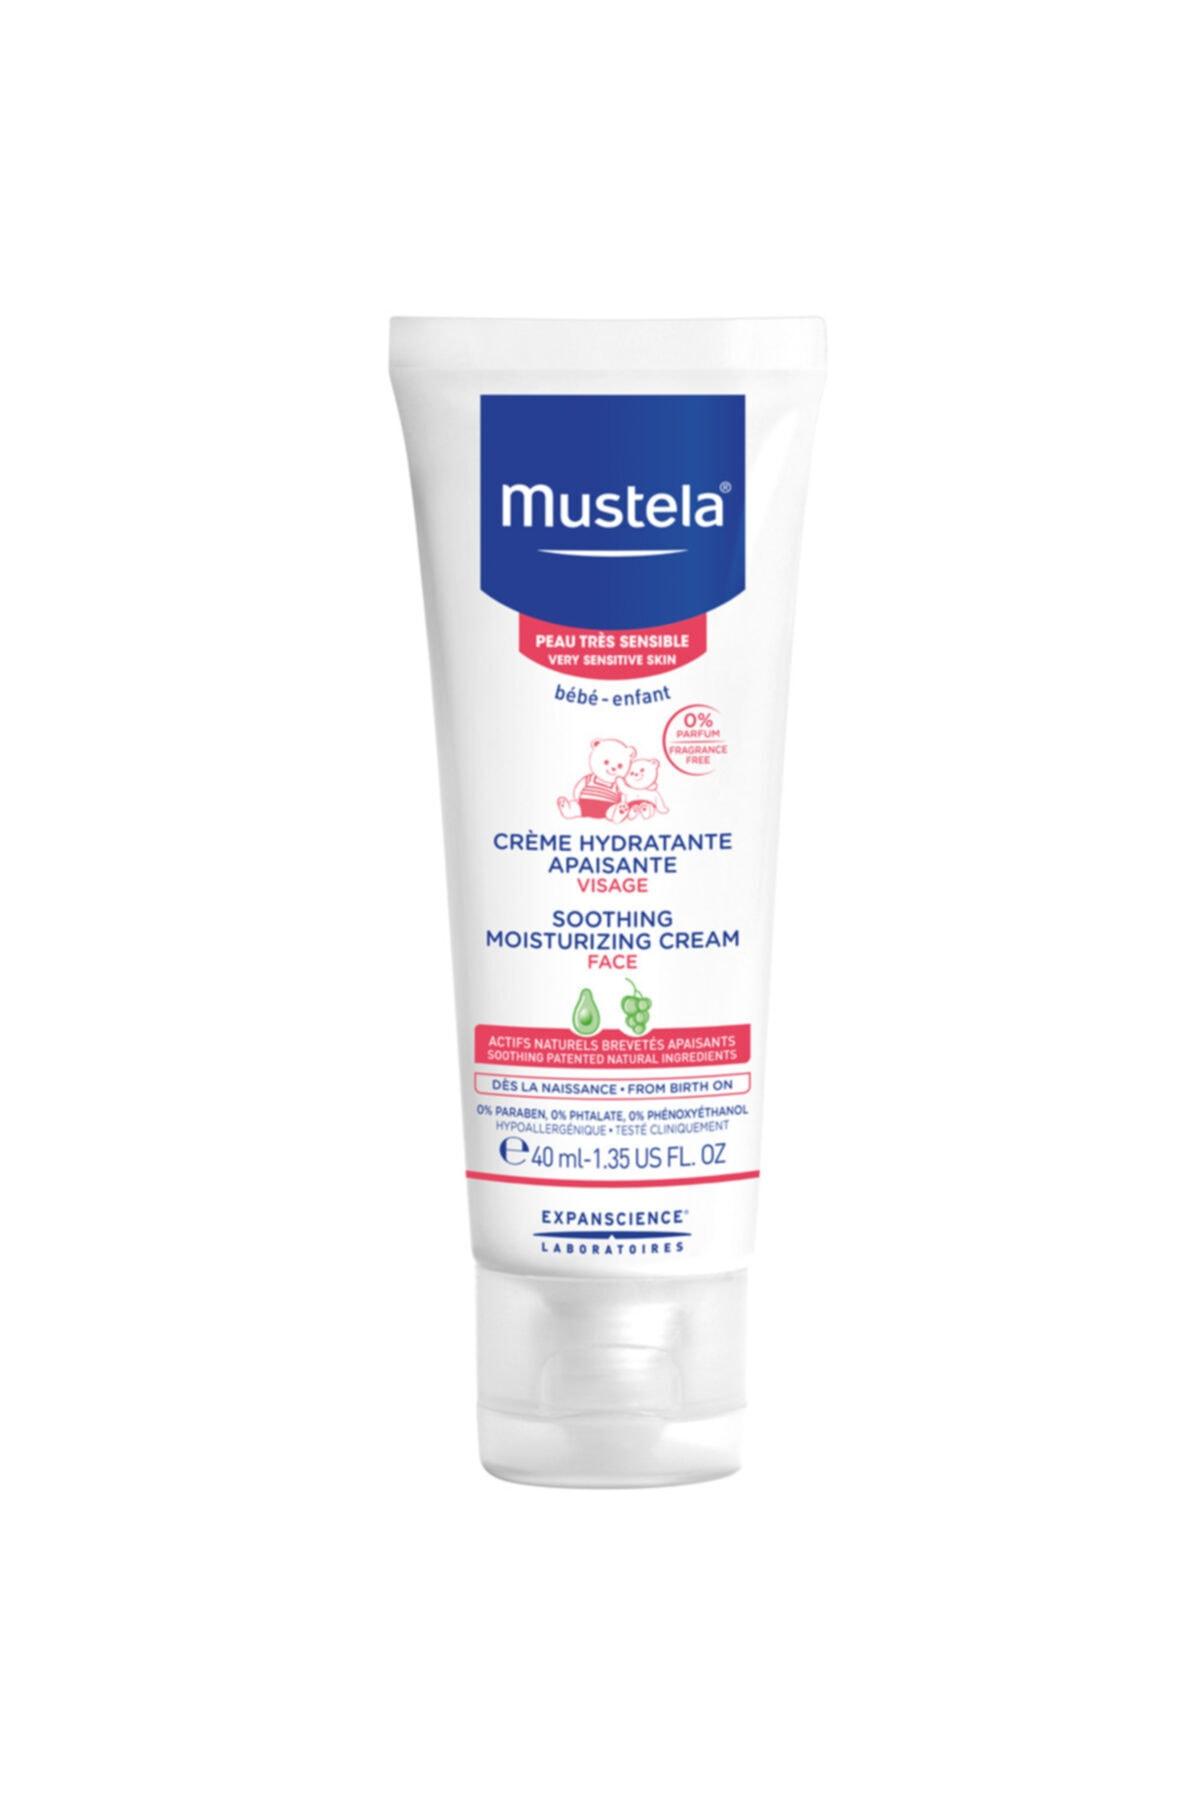 Mustela Soothing Moisturizing Cream 40 Ml 1